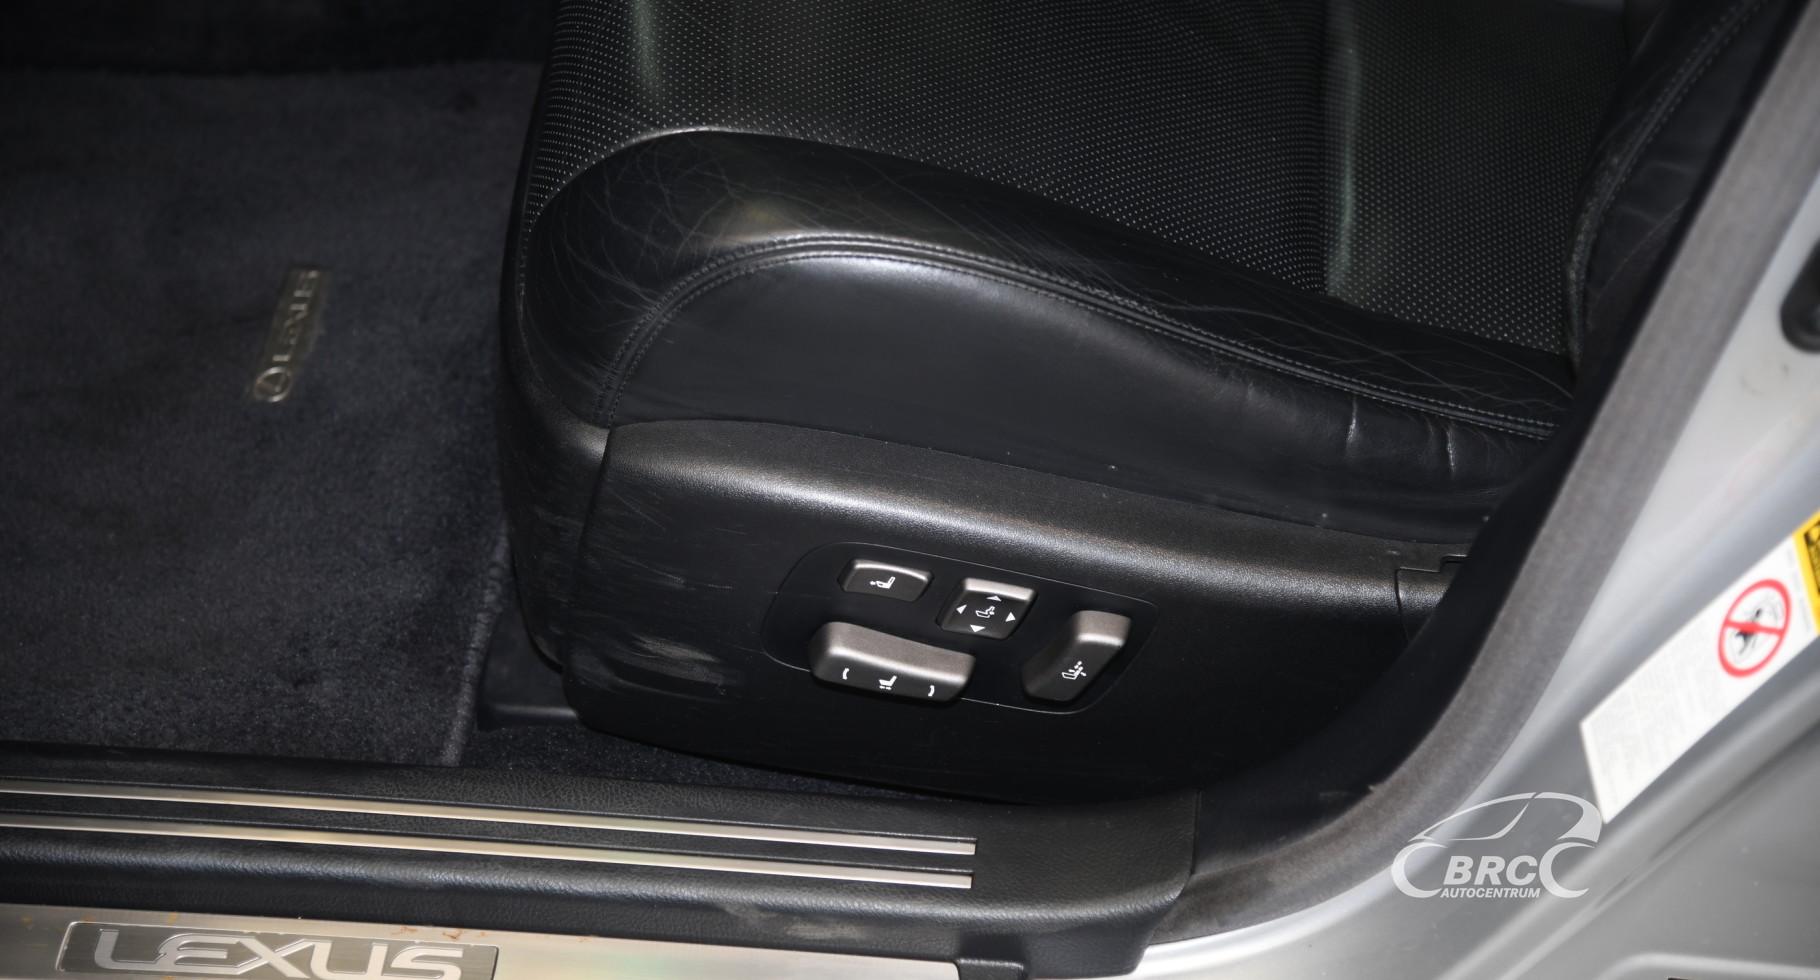 Lexus LS 460 President Automatas